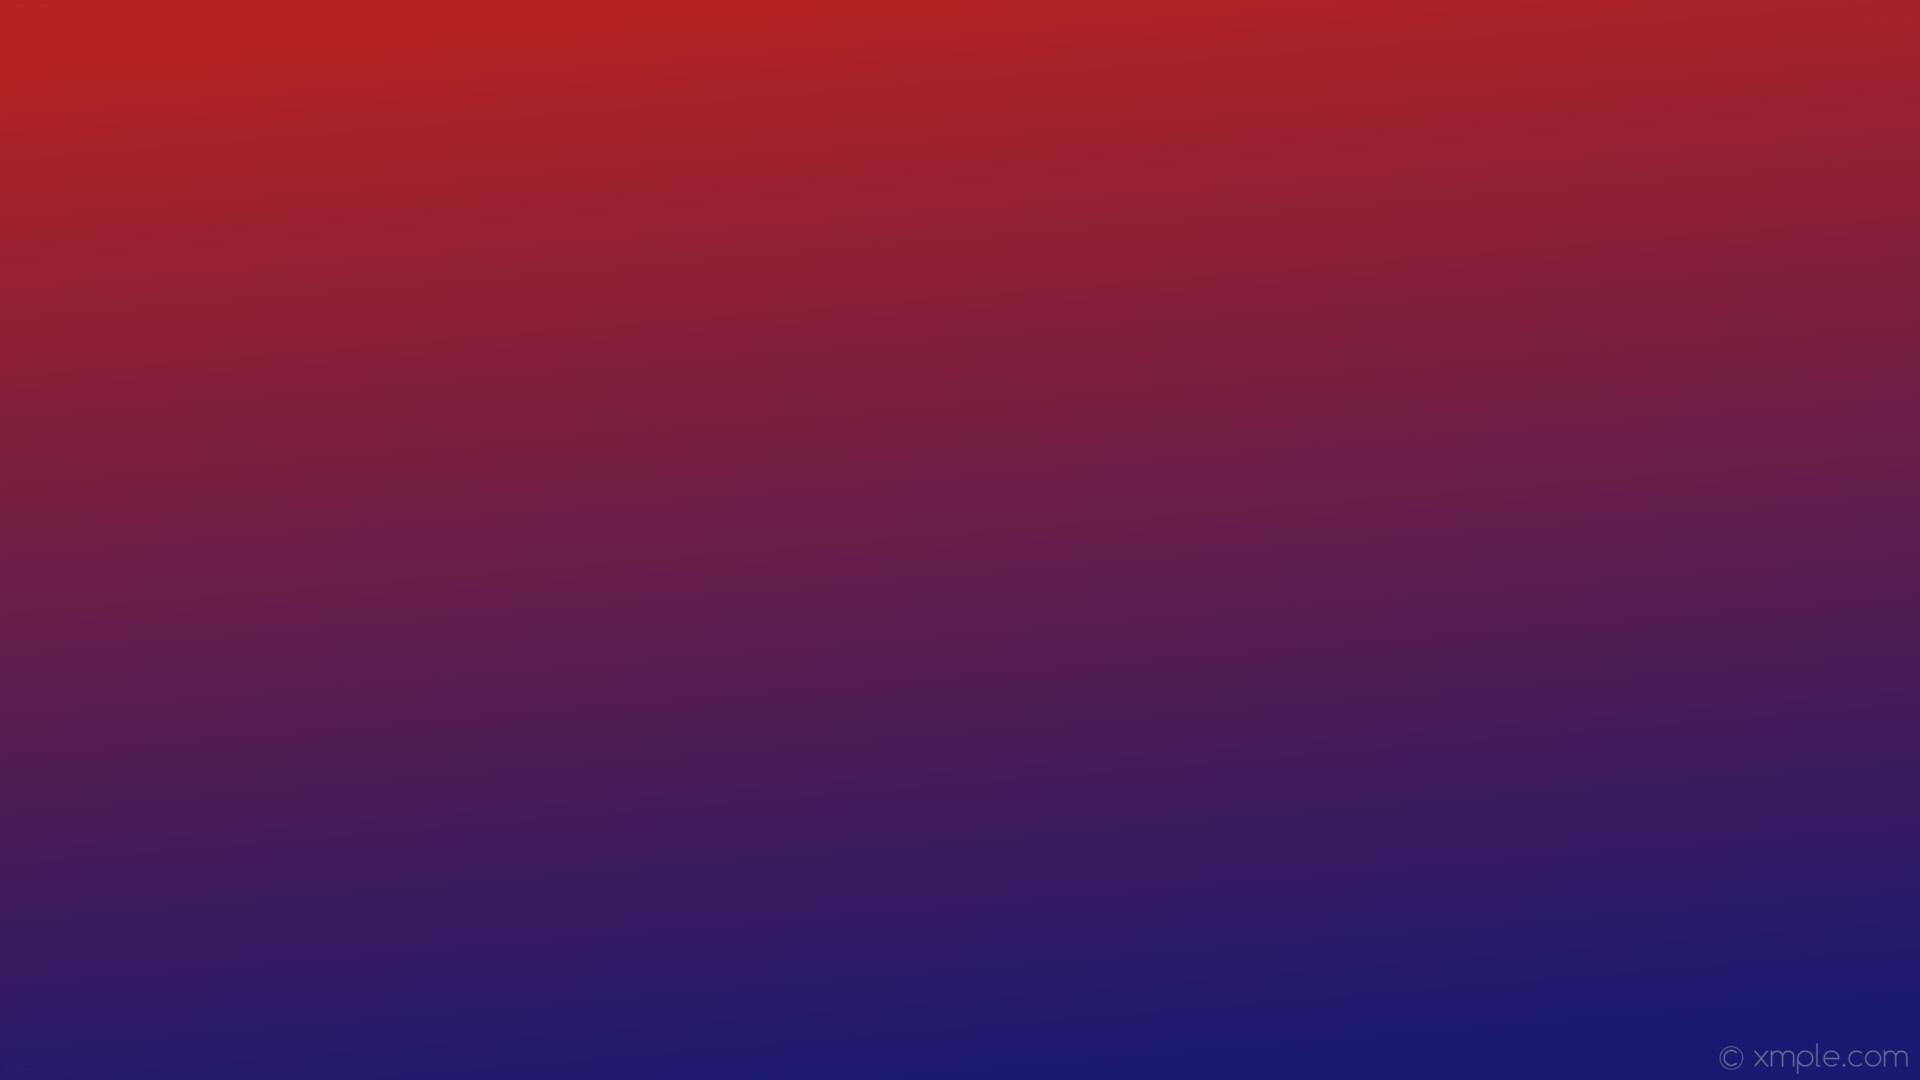 wallpaper gradient red blue linear midnight blue fire brick #191970 #b22222  285°